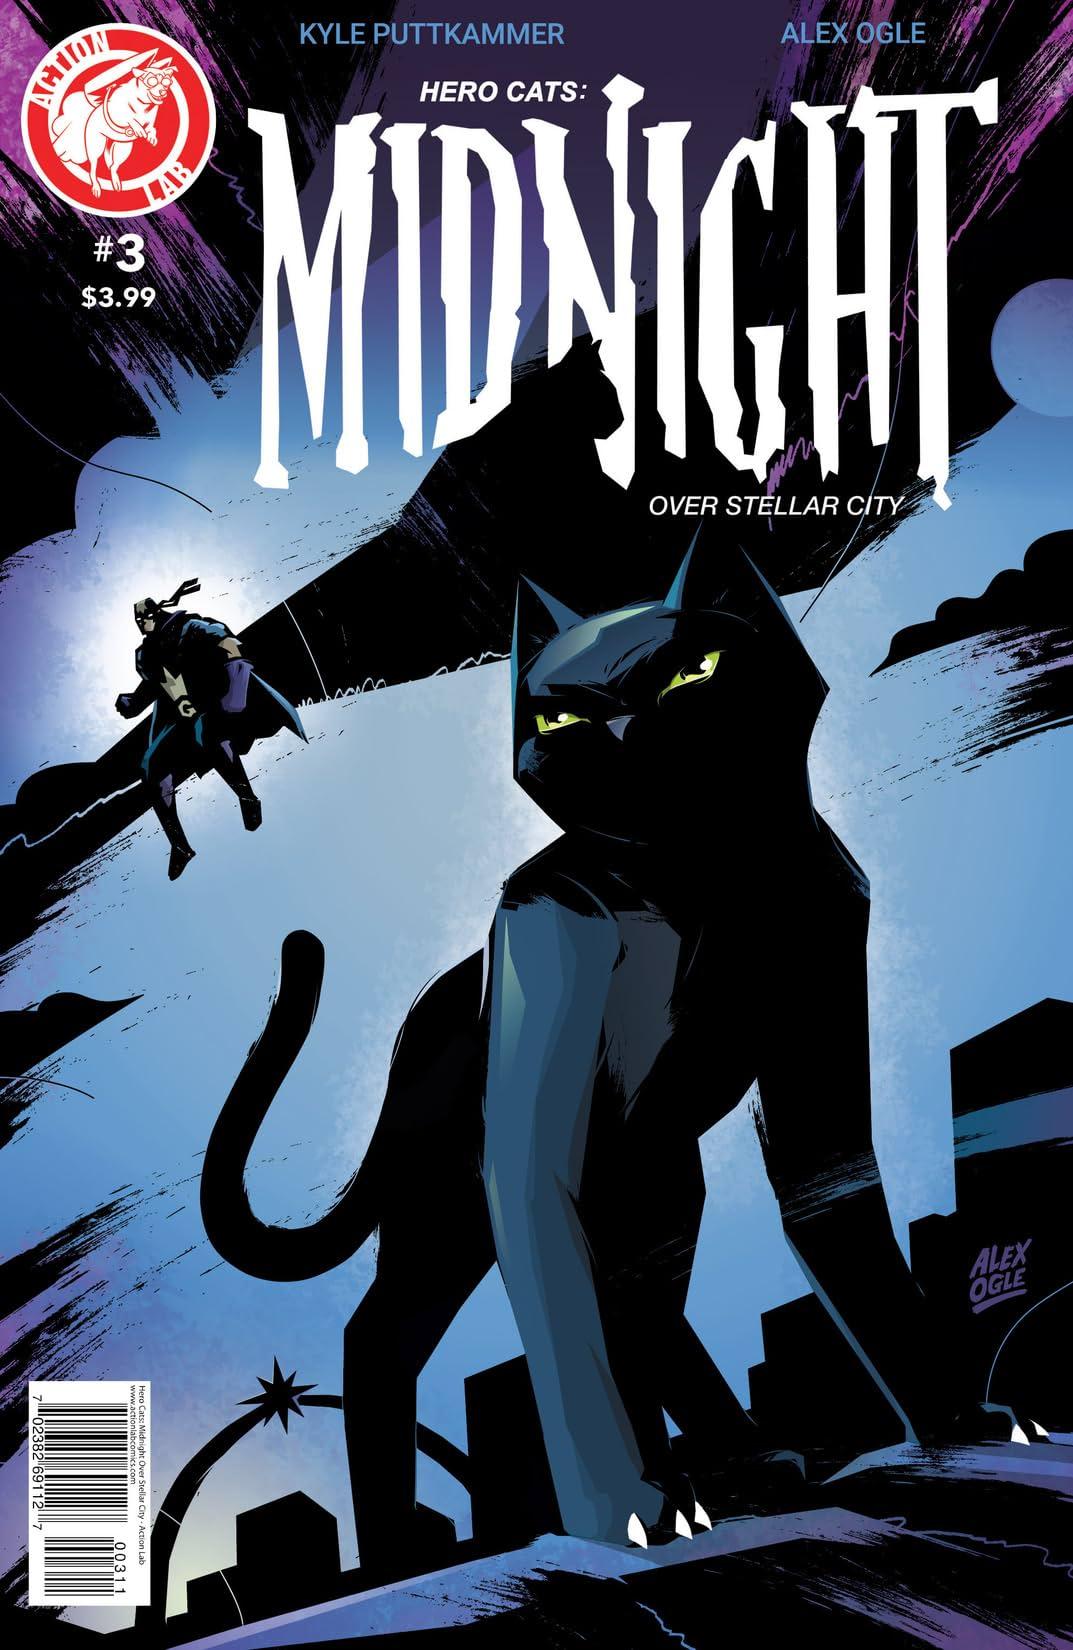 Hero Cats: Midnight Over Stellar City #3